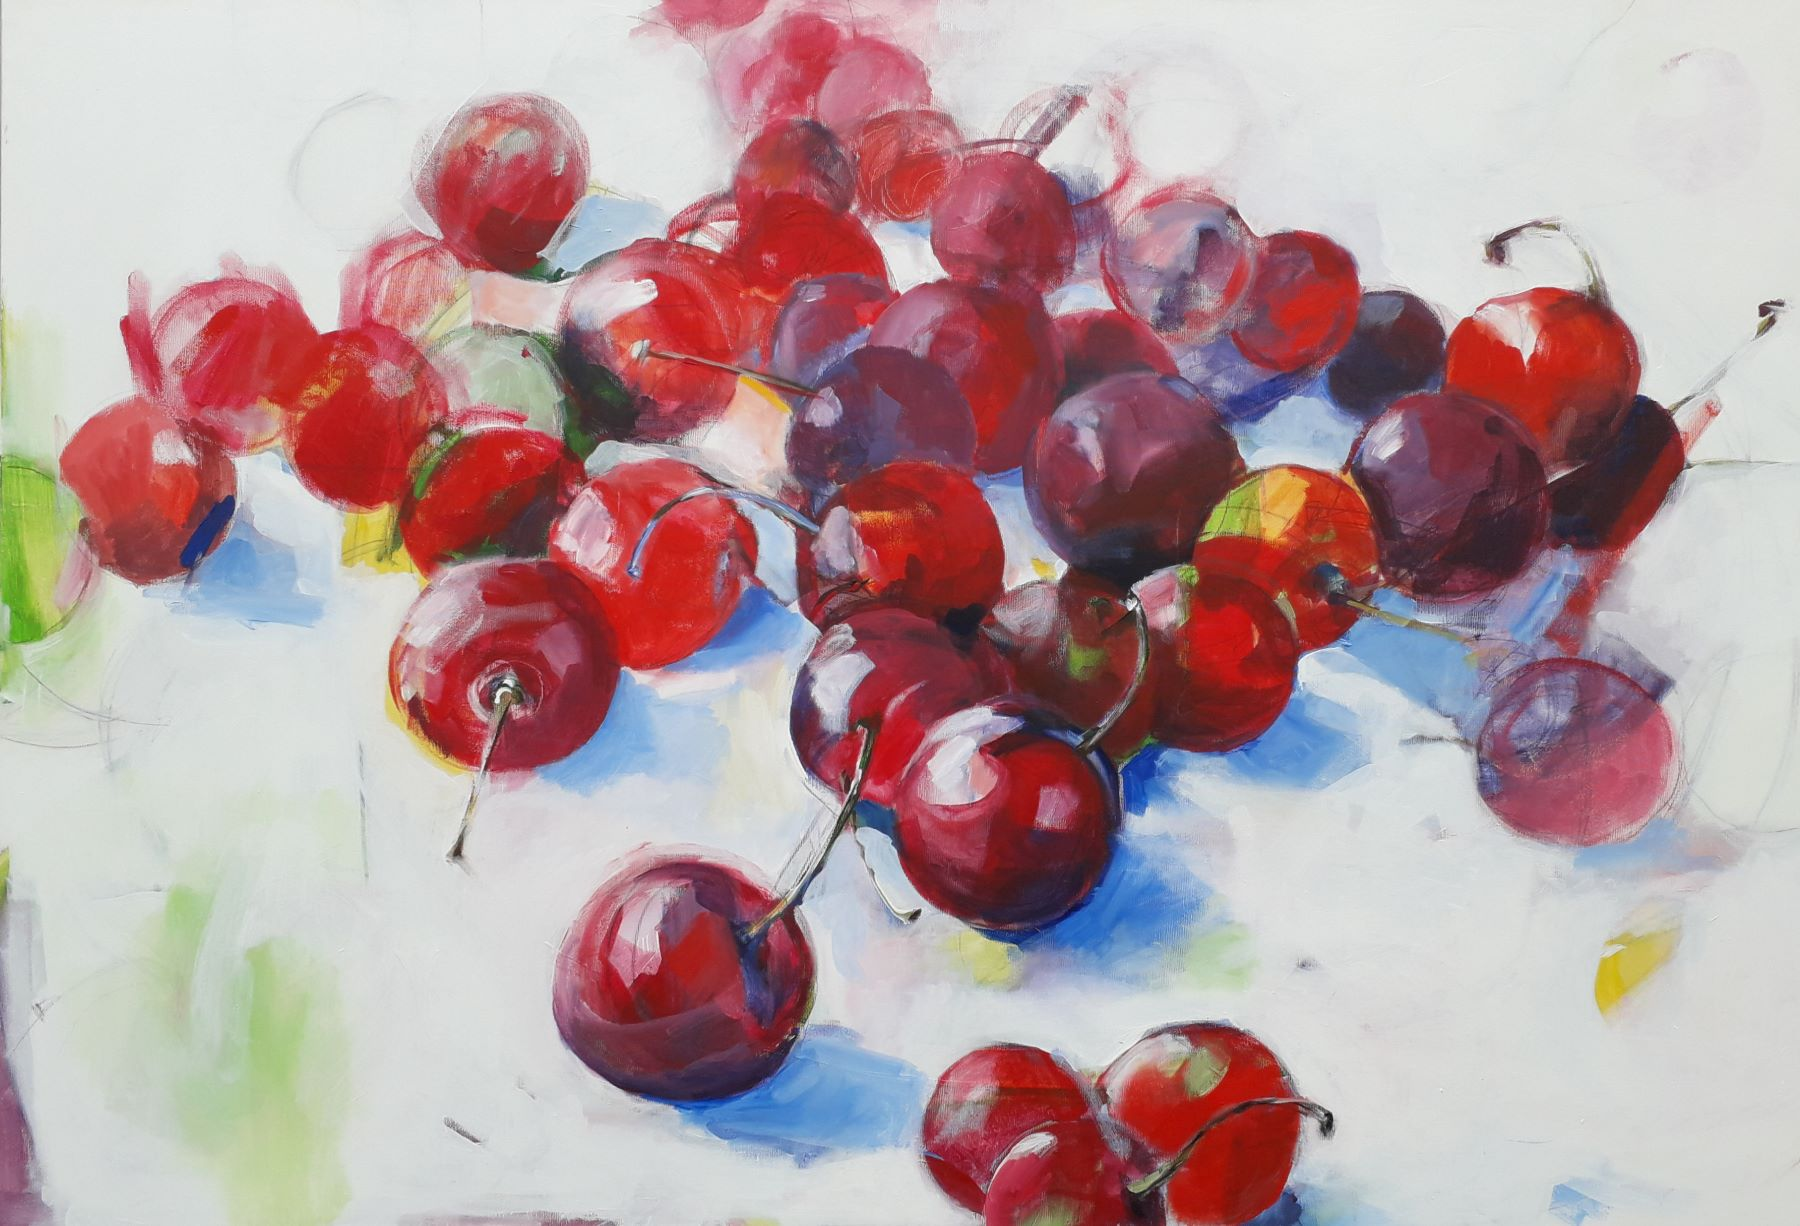 Cherry Lipstick - painting, acrylic on canvas by artist Neva Bergemann